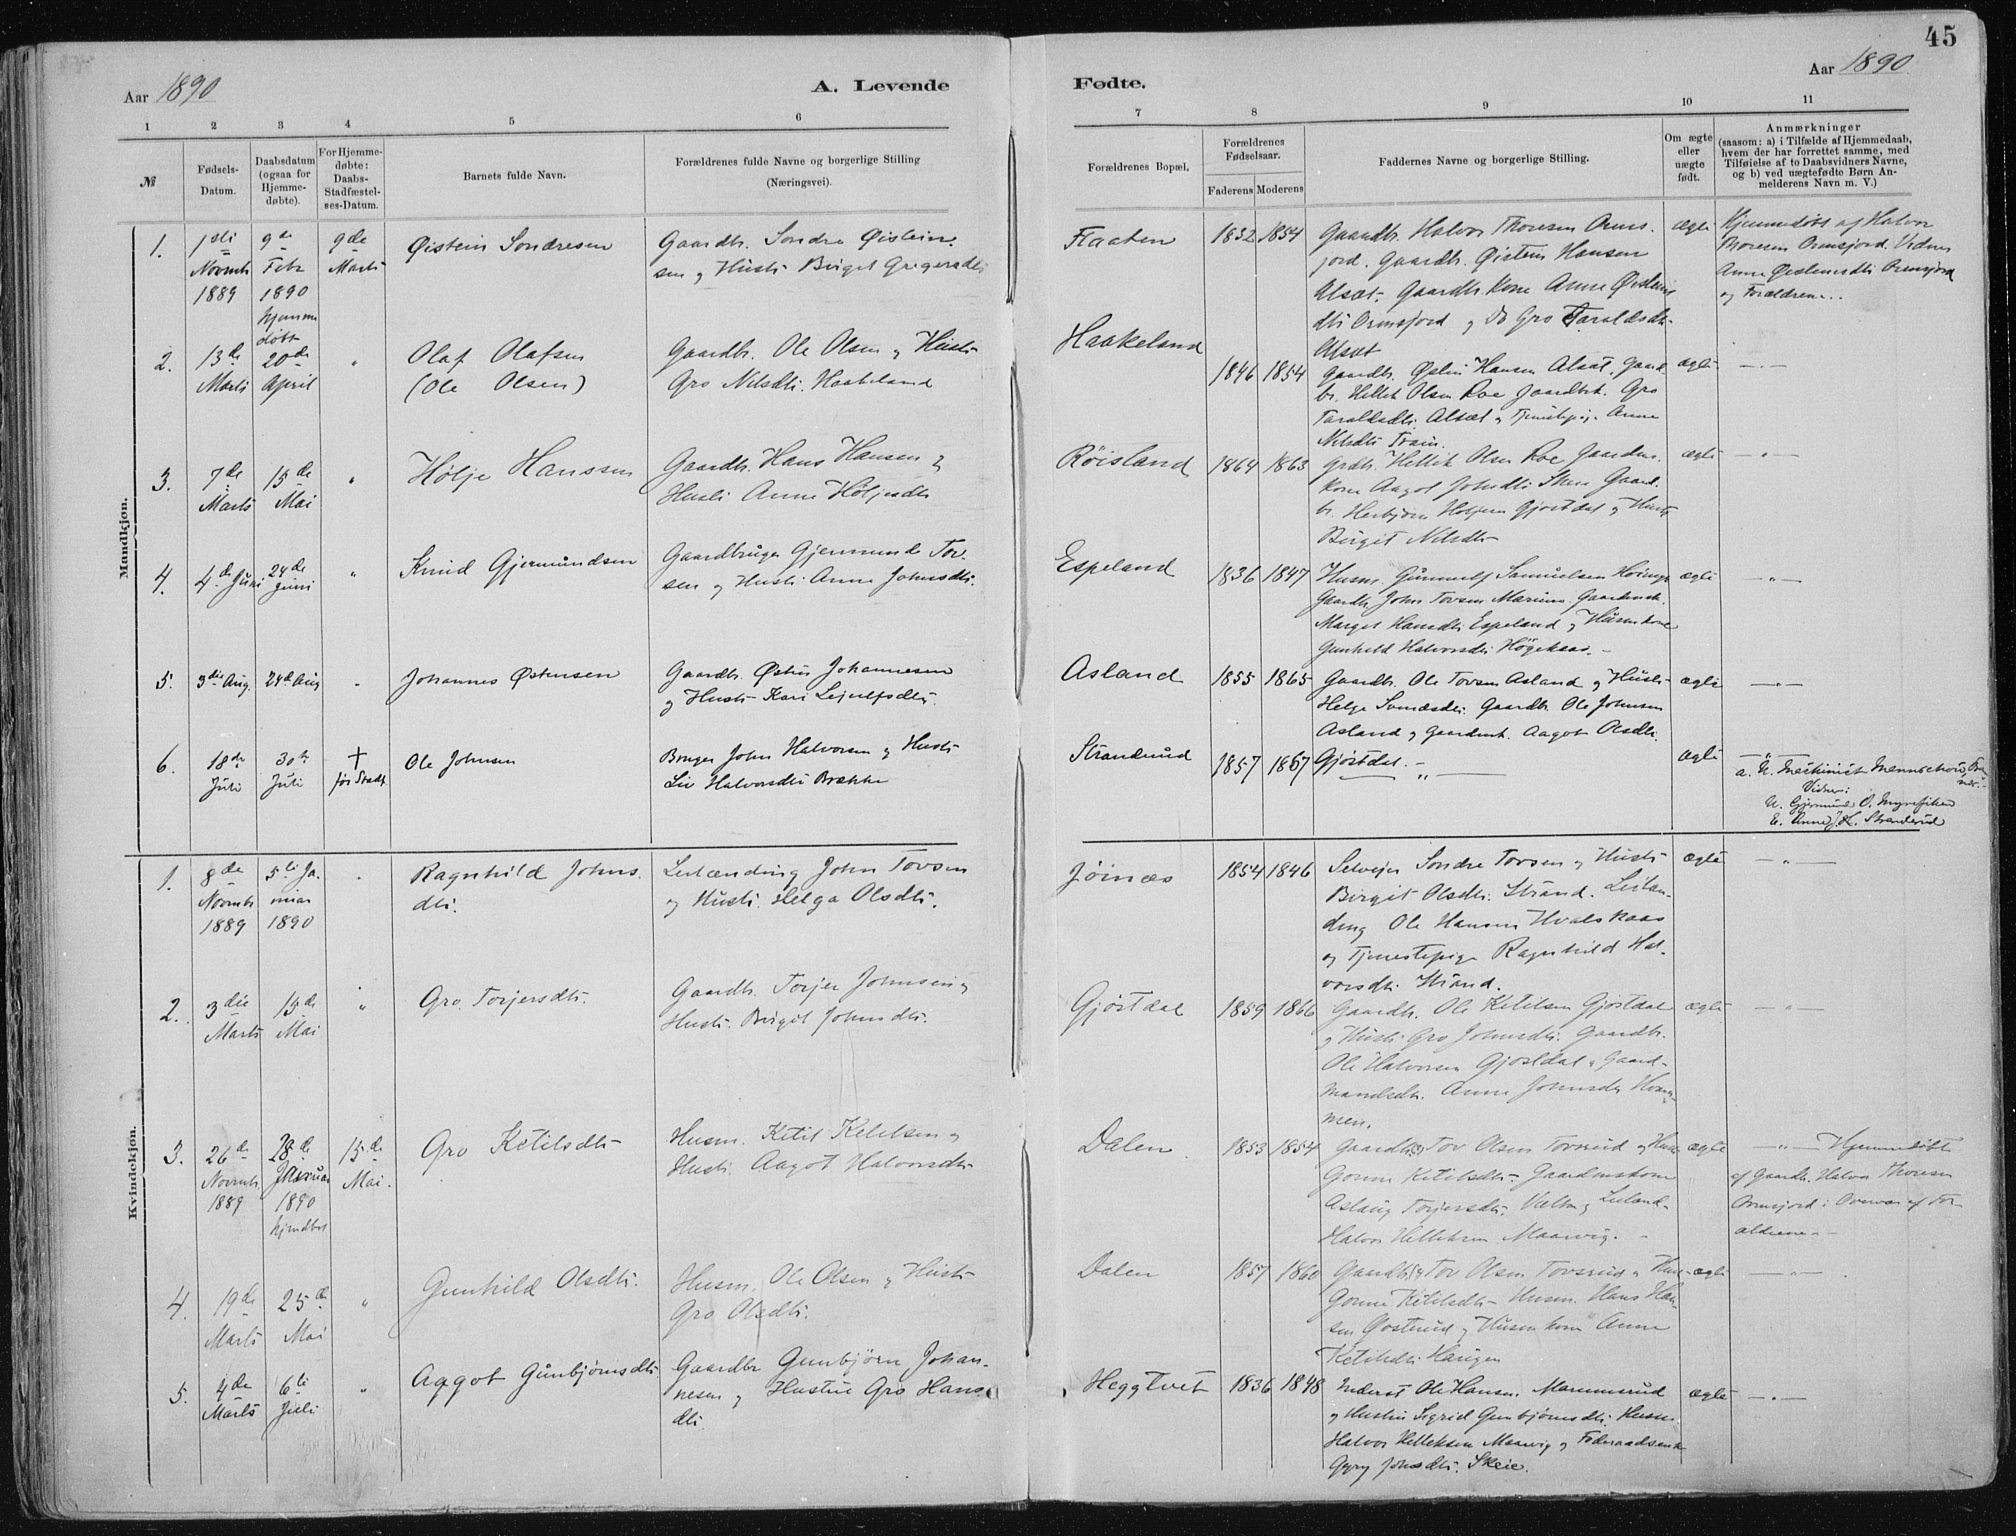 SAKO, Tinn kirkebøker, F/Fa/L0007: Ministerialbok nr. I 7, 1878-1922, s. 45